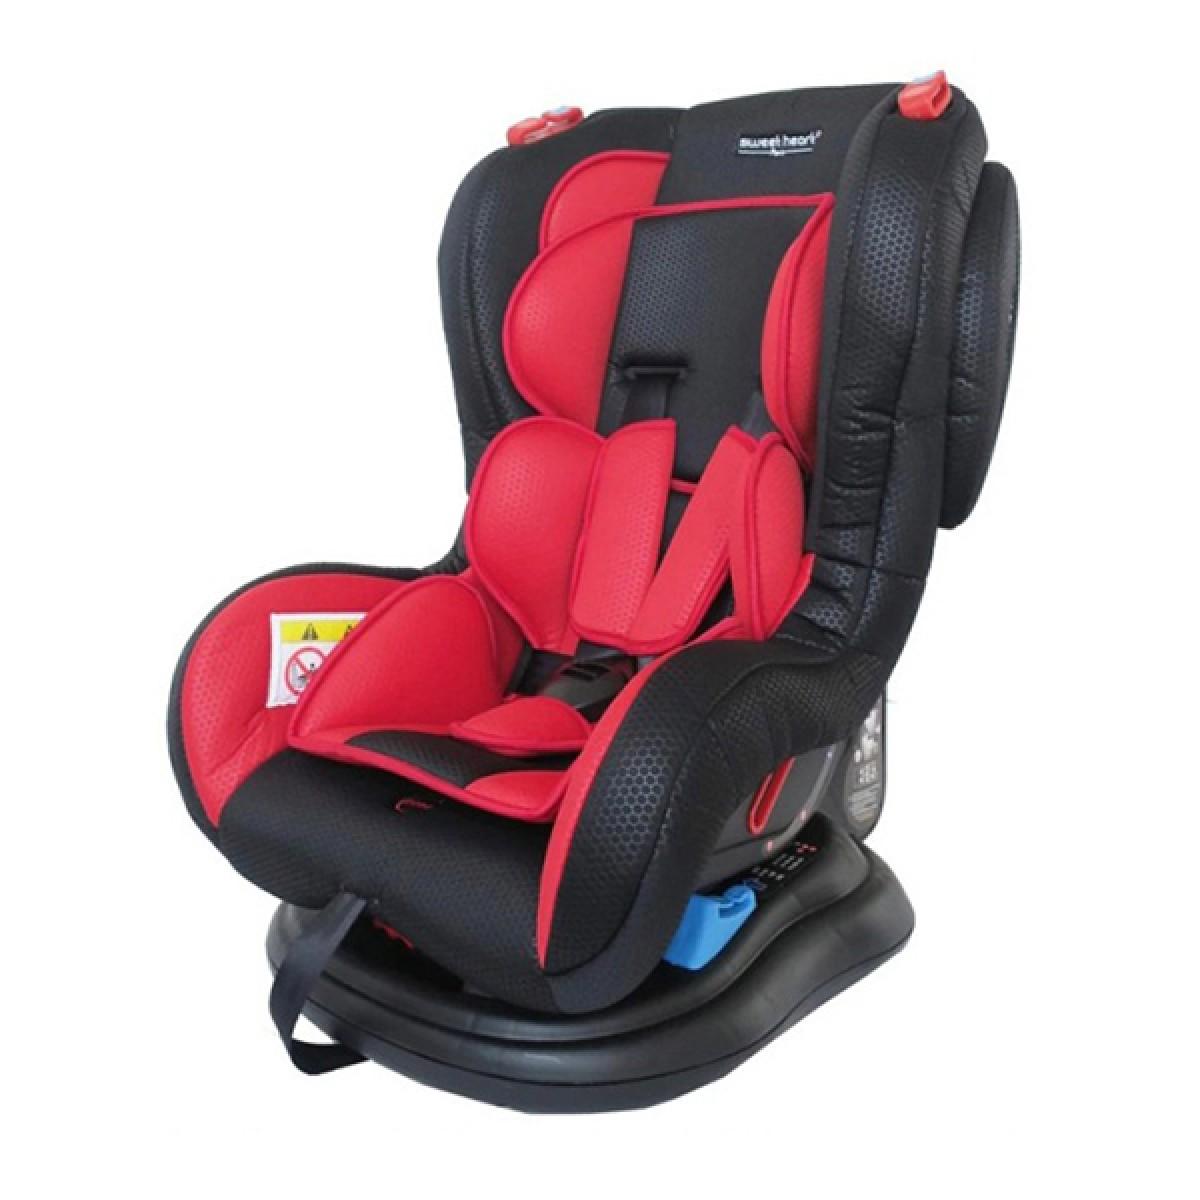 Legnum Car Seat - Kico Baby Center